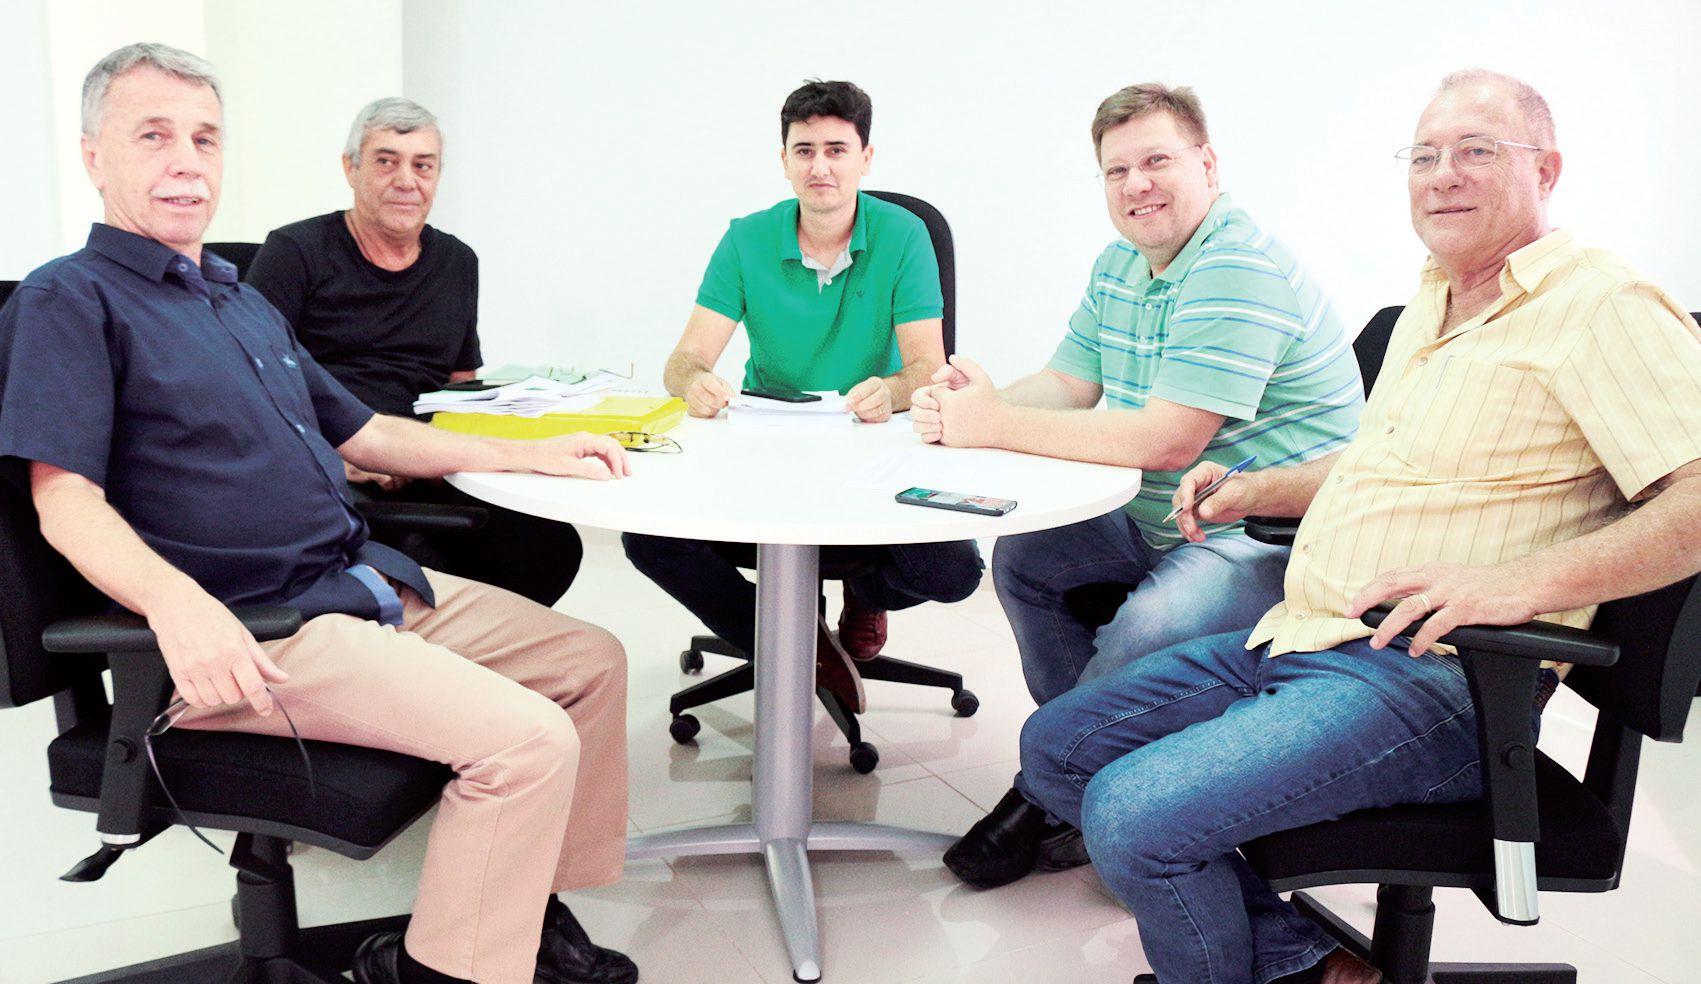 Diretor financeiro José Luiz, coordenador geral de controladoria Leonel Riberto Luiz, vereadores Mateus Scarso e Júnior Pazianotto e diretor geral Li Piazza